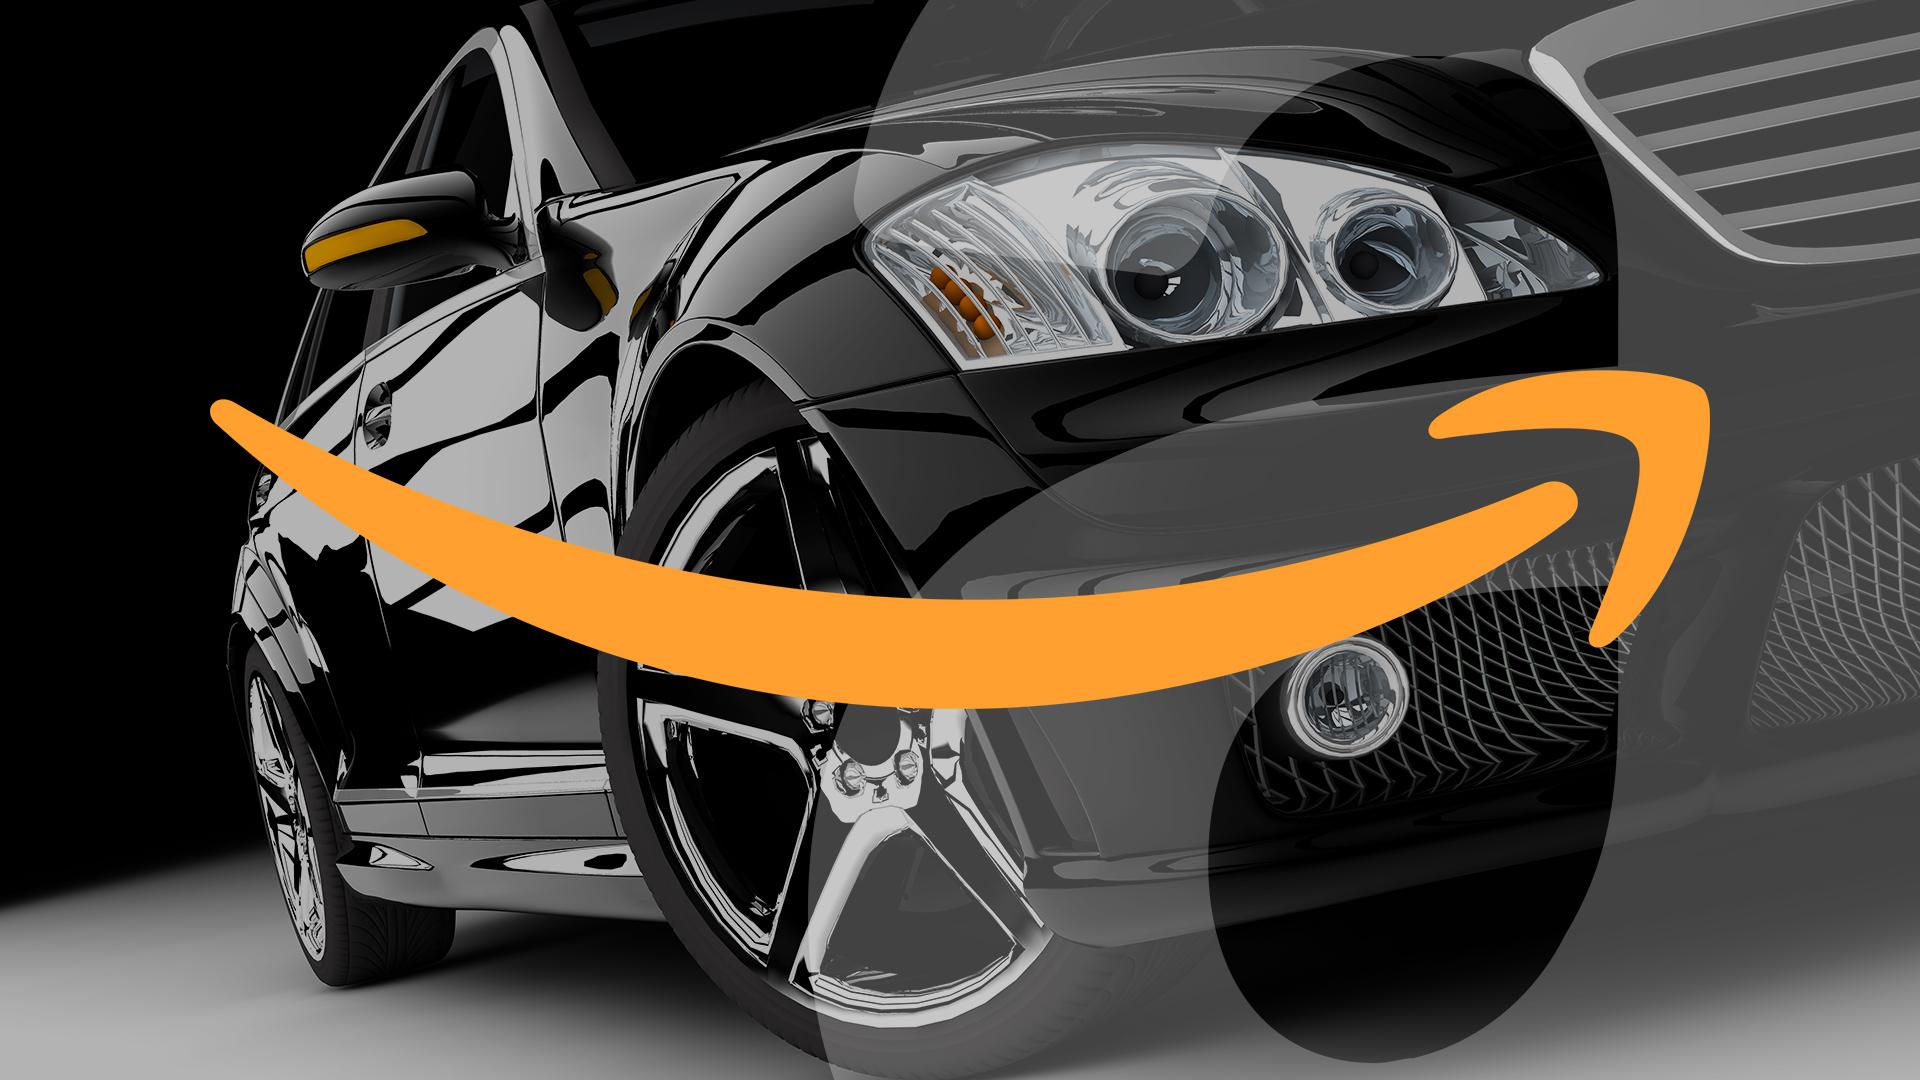 Amazon เปิดตัว Amazon Vehicles แหล่งข้อมูลรถใหม่สำหรับนักช็อป!